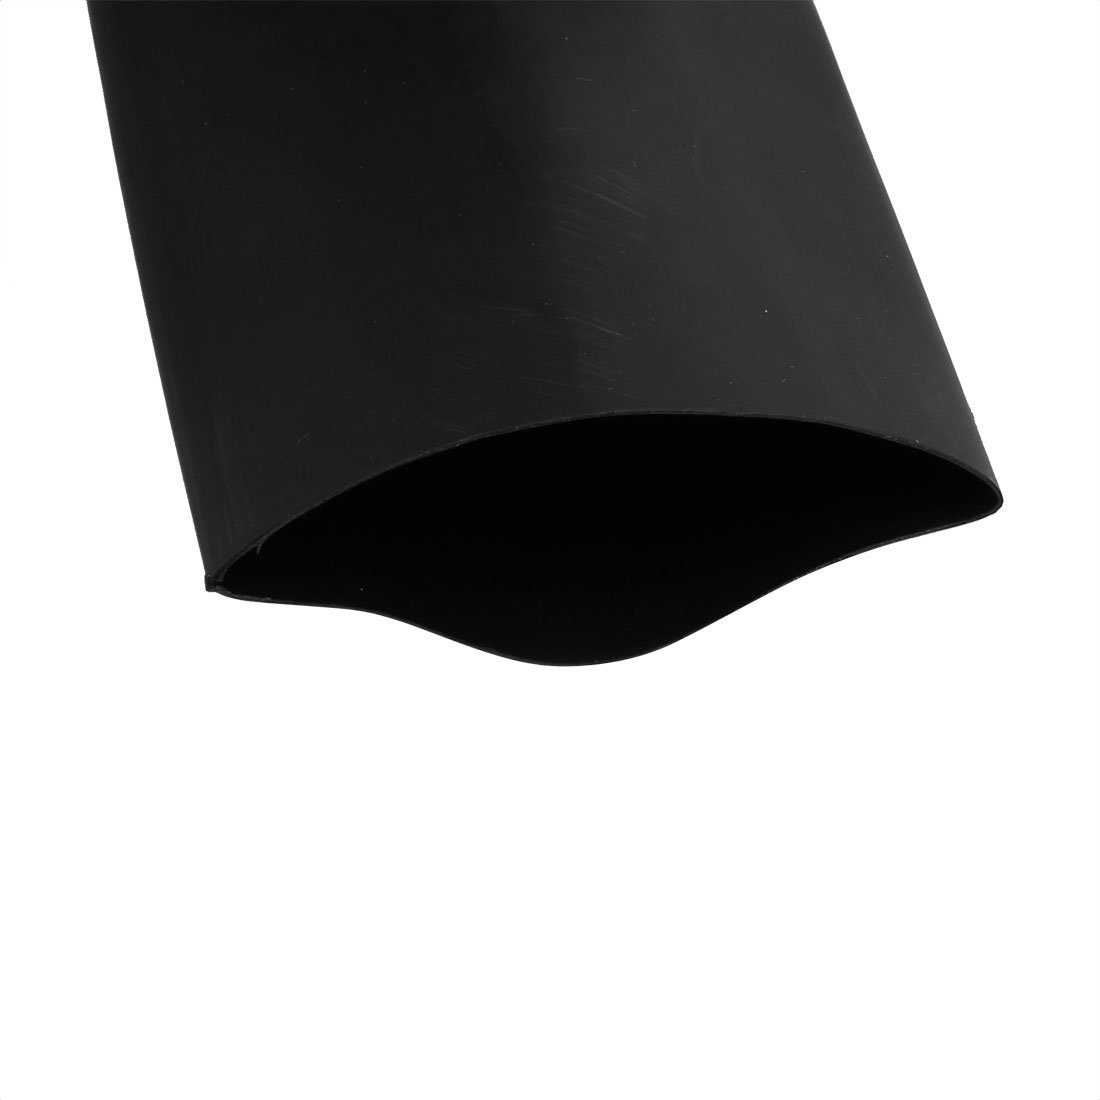 sourcing map Tubo termoretr/áctil negro de conexi/ón arrollada de 1m de longitud 40mm di/ámetro interior aislado de poliolefina